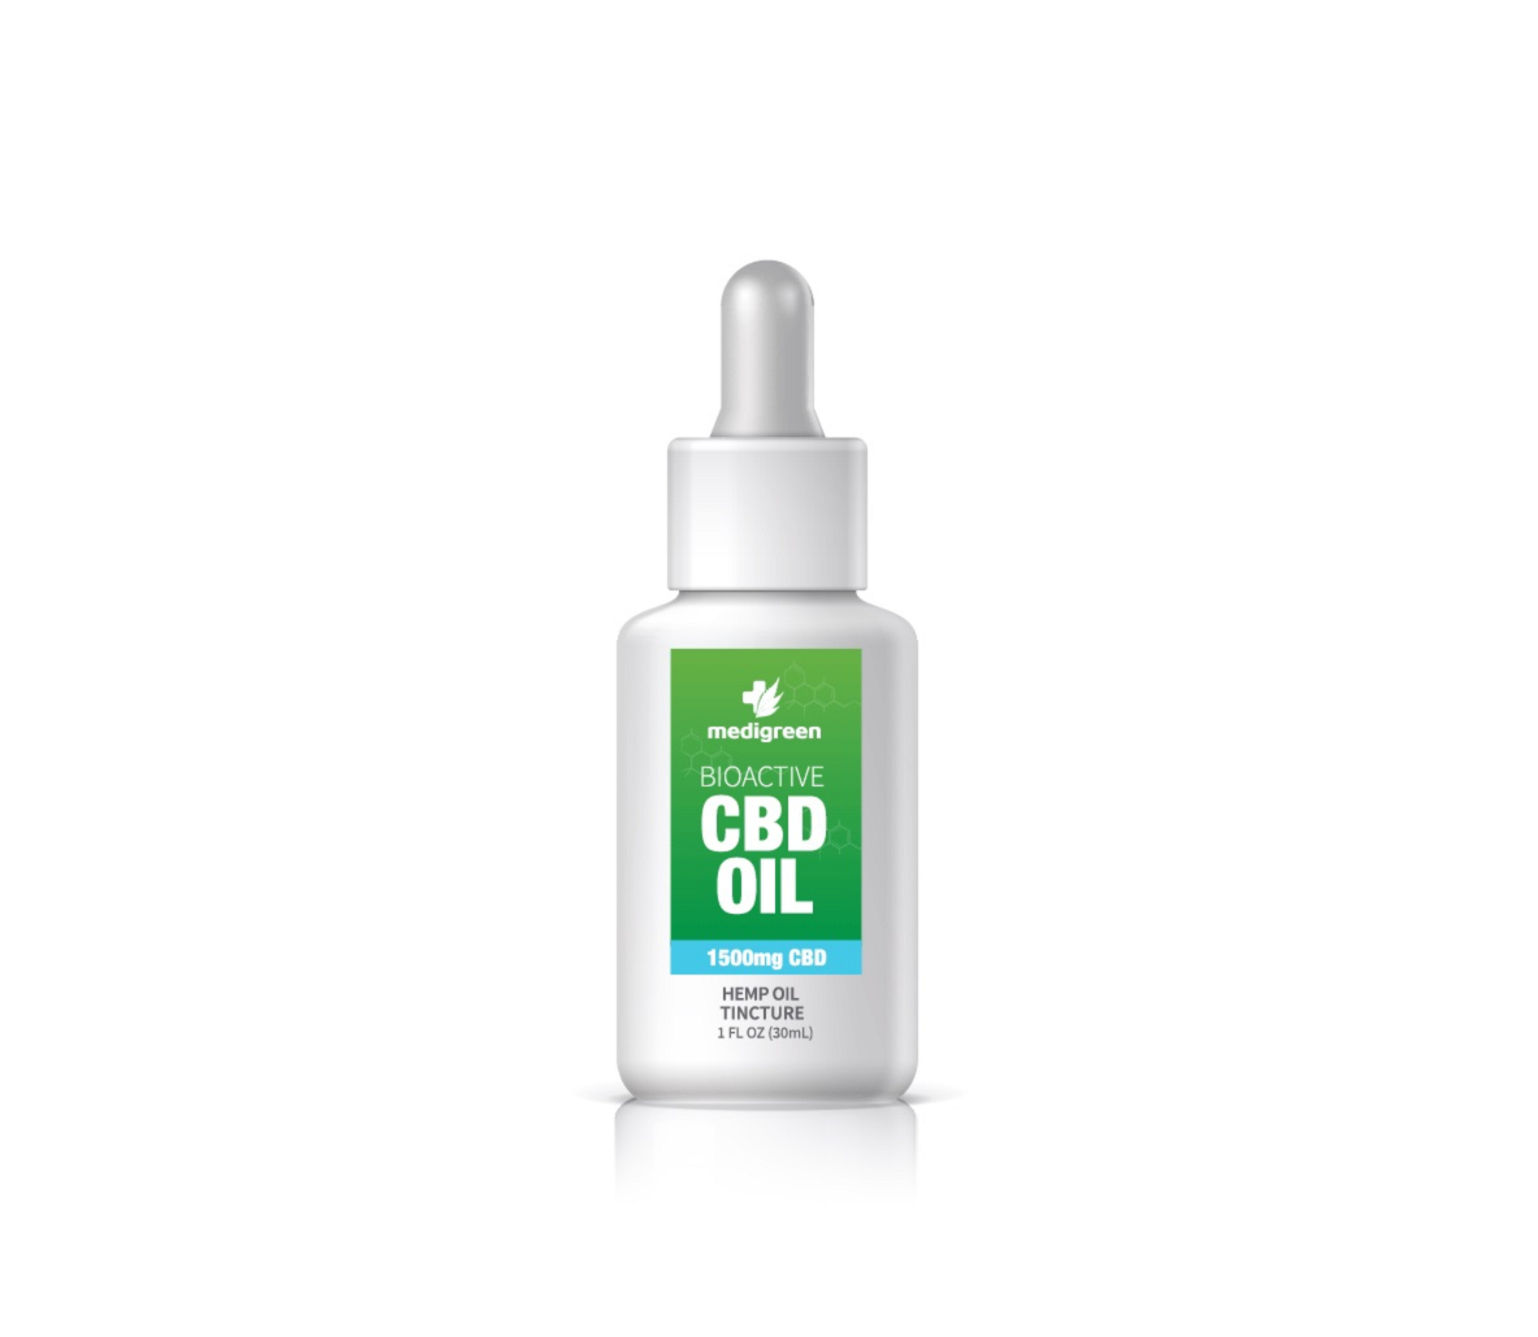 1x MediGreen Bioactive CBD Hemp Oil Tincture – 1500mg CBD (30ml)